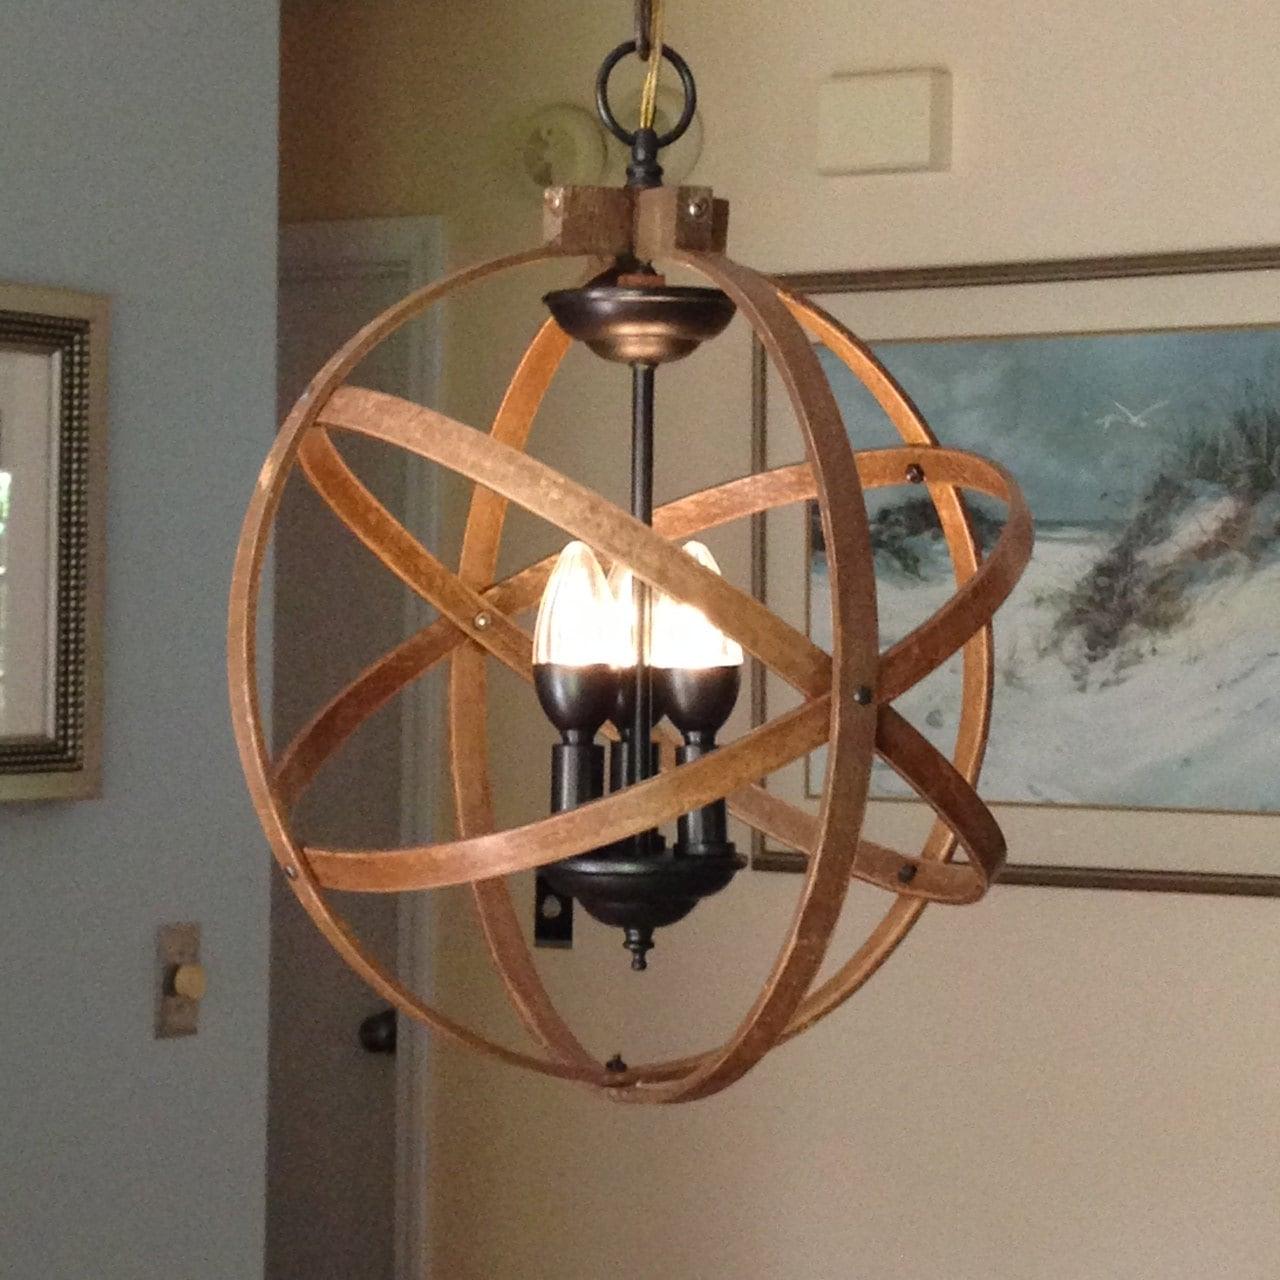 Orb chandelier light 14 atomic light fixture industrial zoom arubaitofo Choice Image